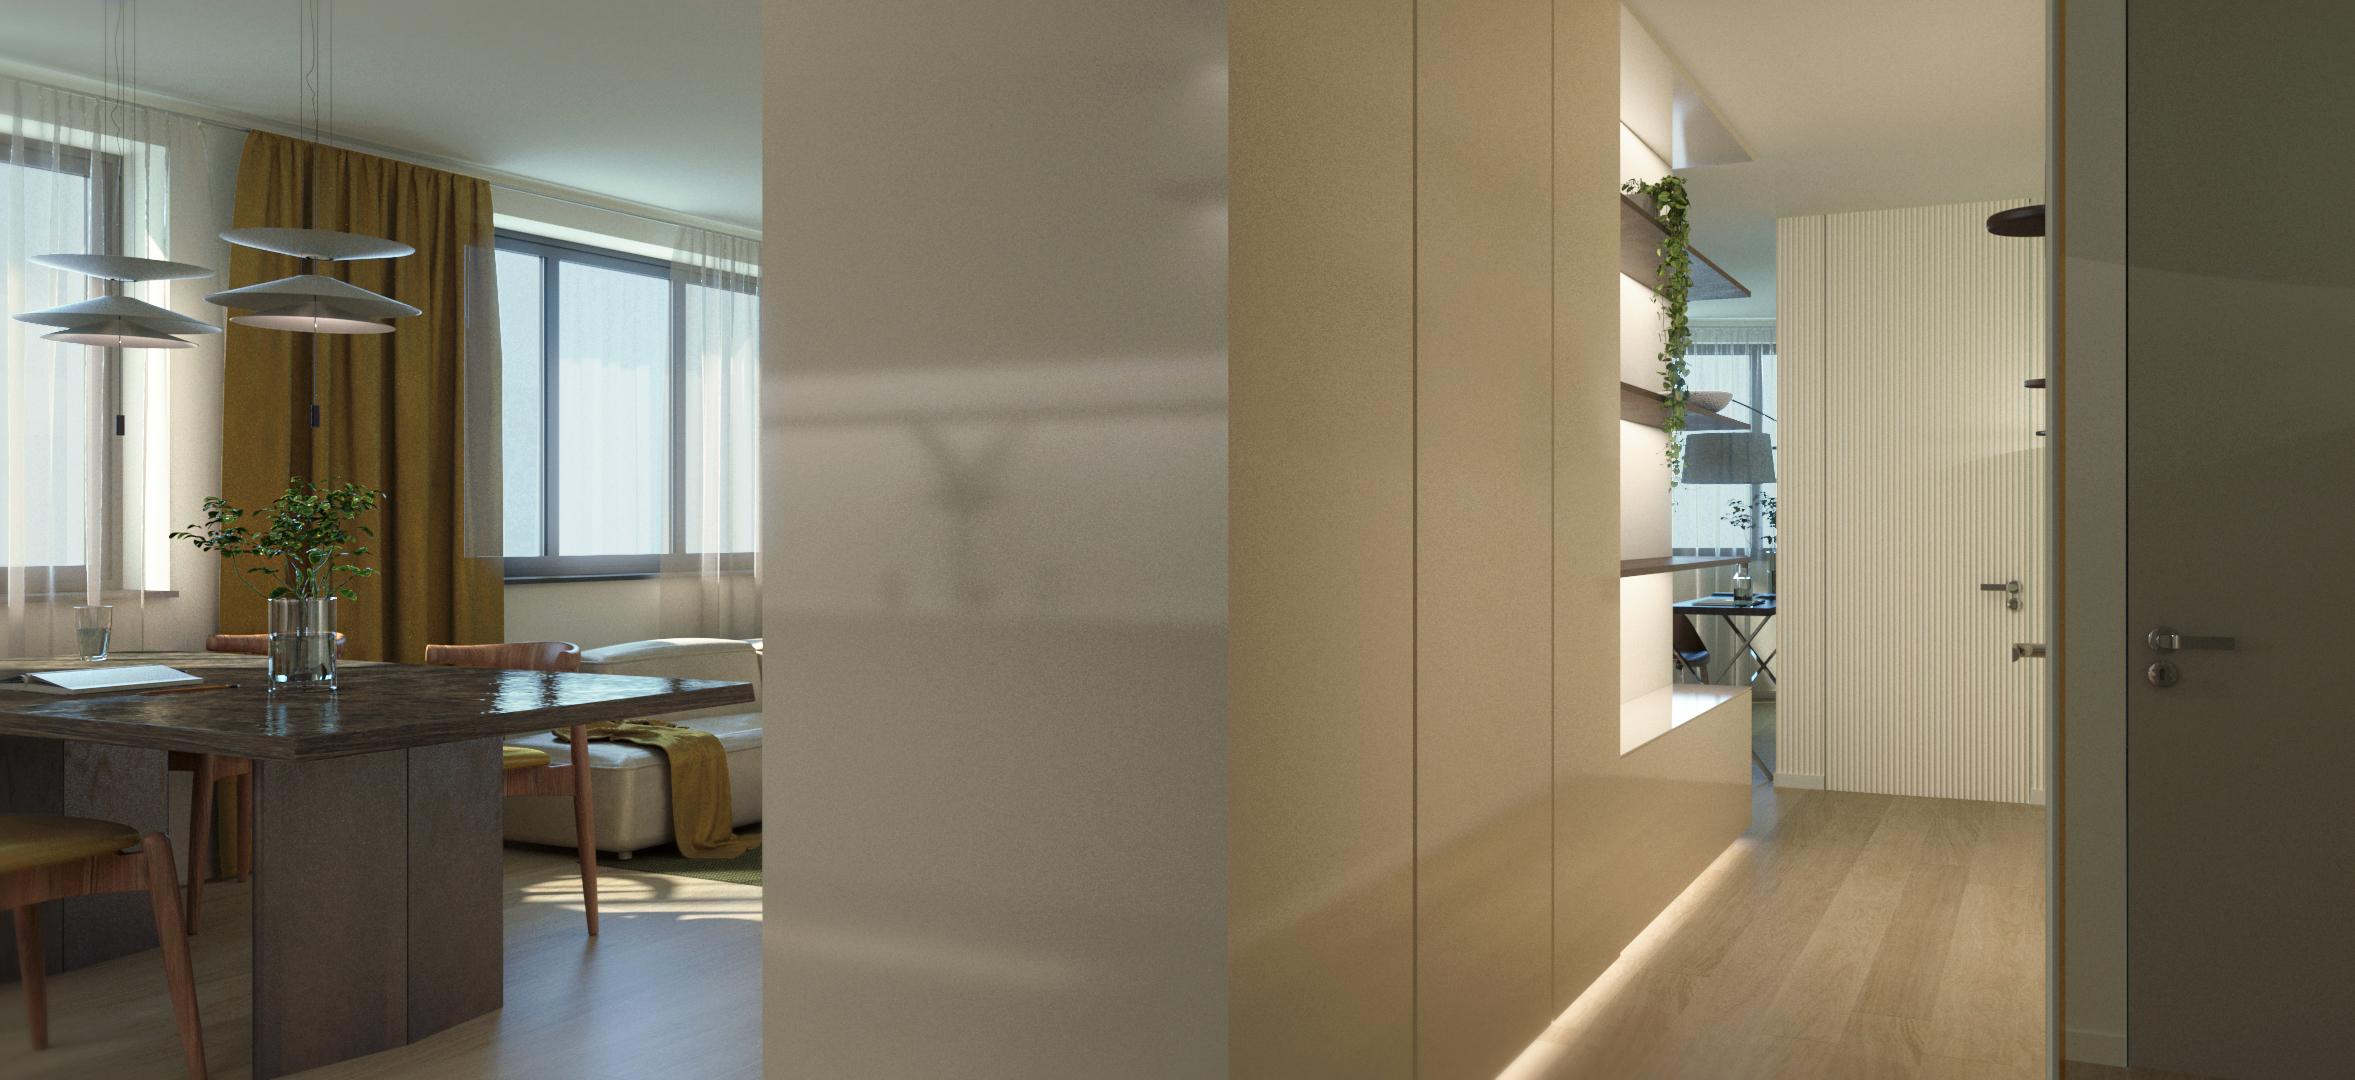 London_Apartment_Gila_Shemie_Zakay_Bre (11).jpg